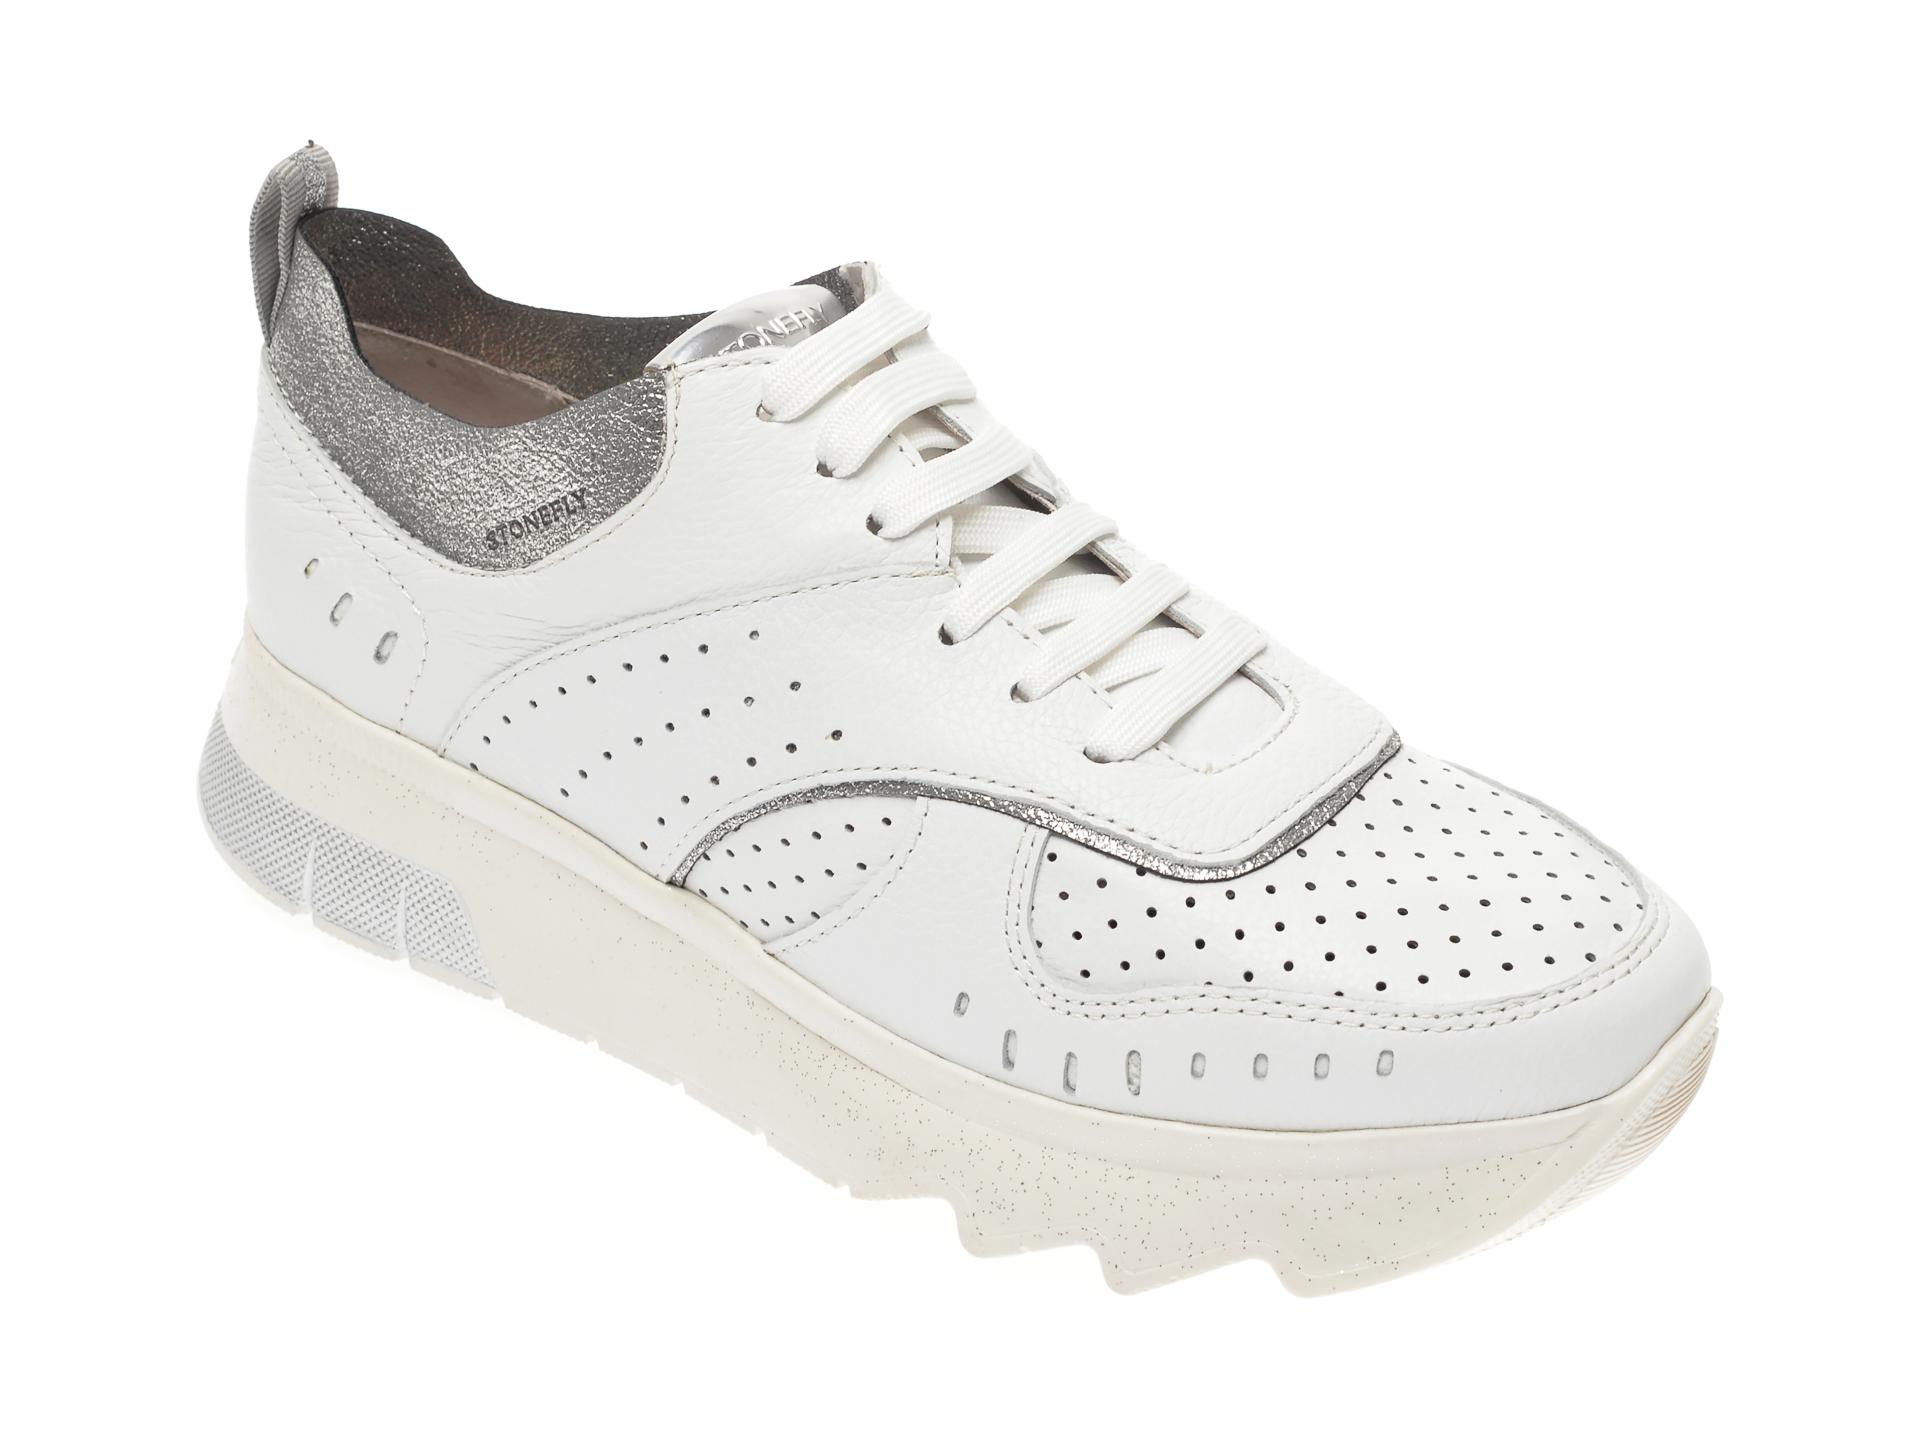 Pantofi sport STONEFLY albi, SPOCK14, din piele naturala